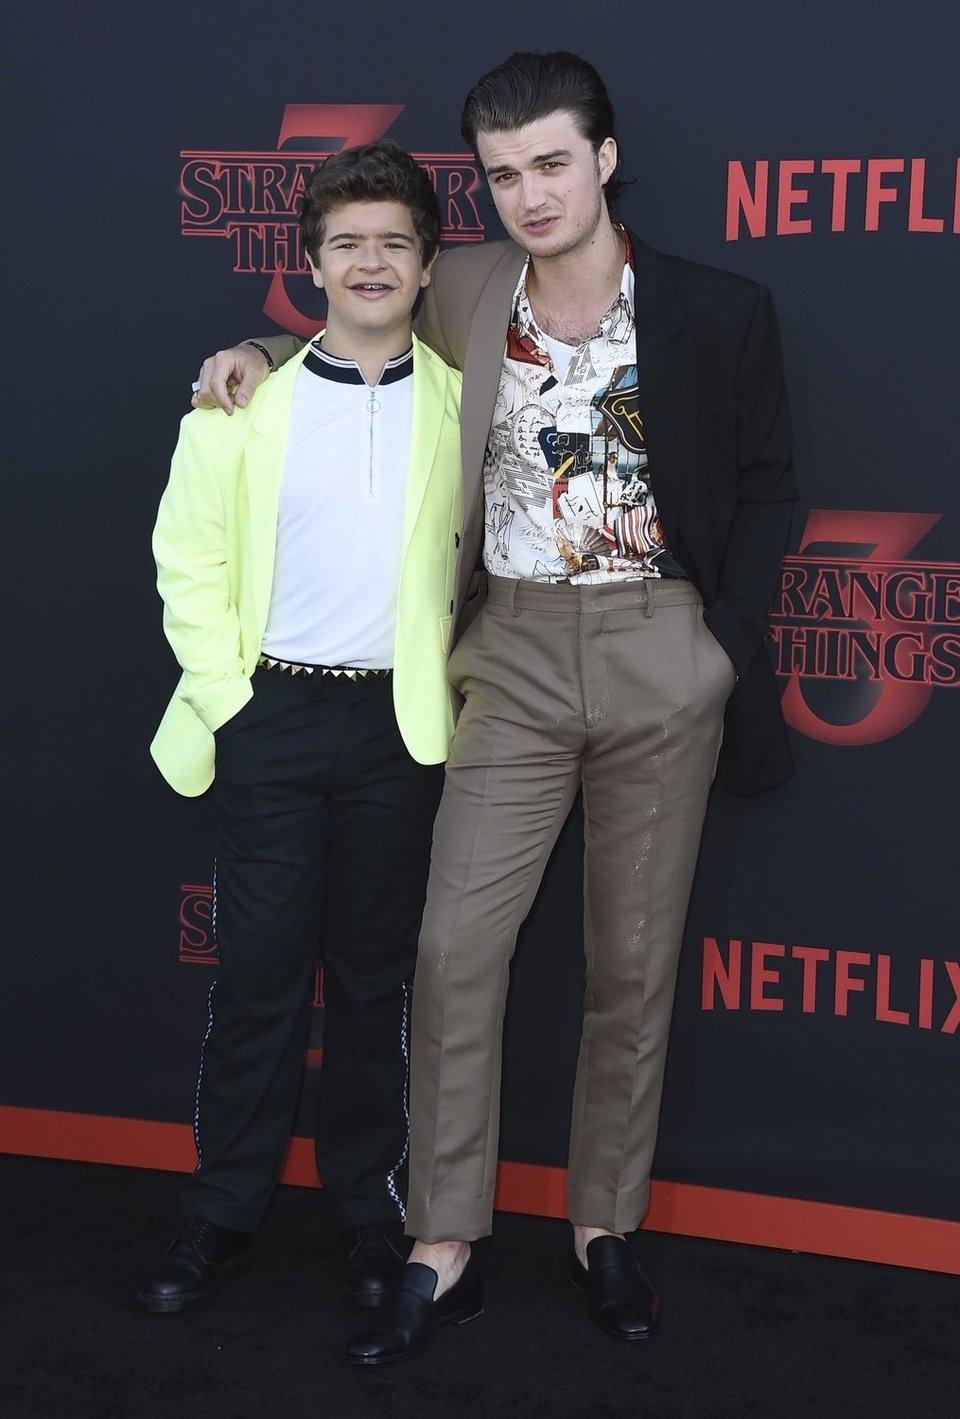 Gaten Matarazzo y Joe Keery en la premiere de la tercera temporada de 'Stranger Things'